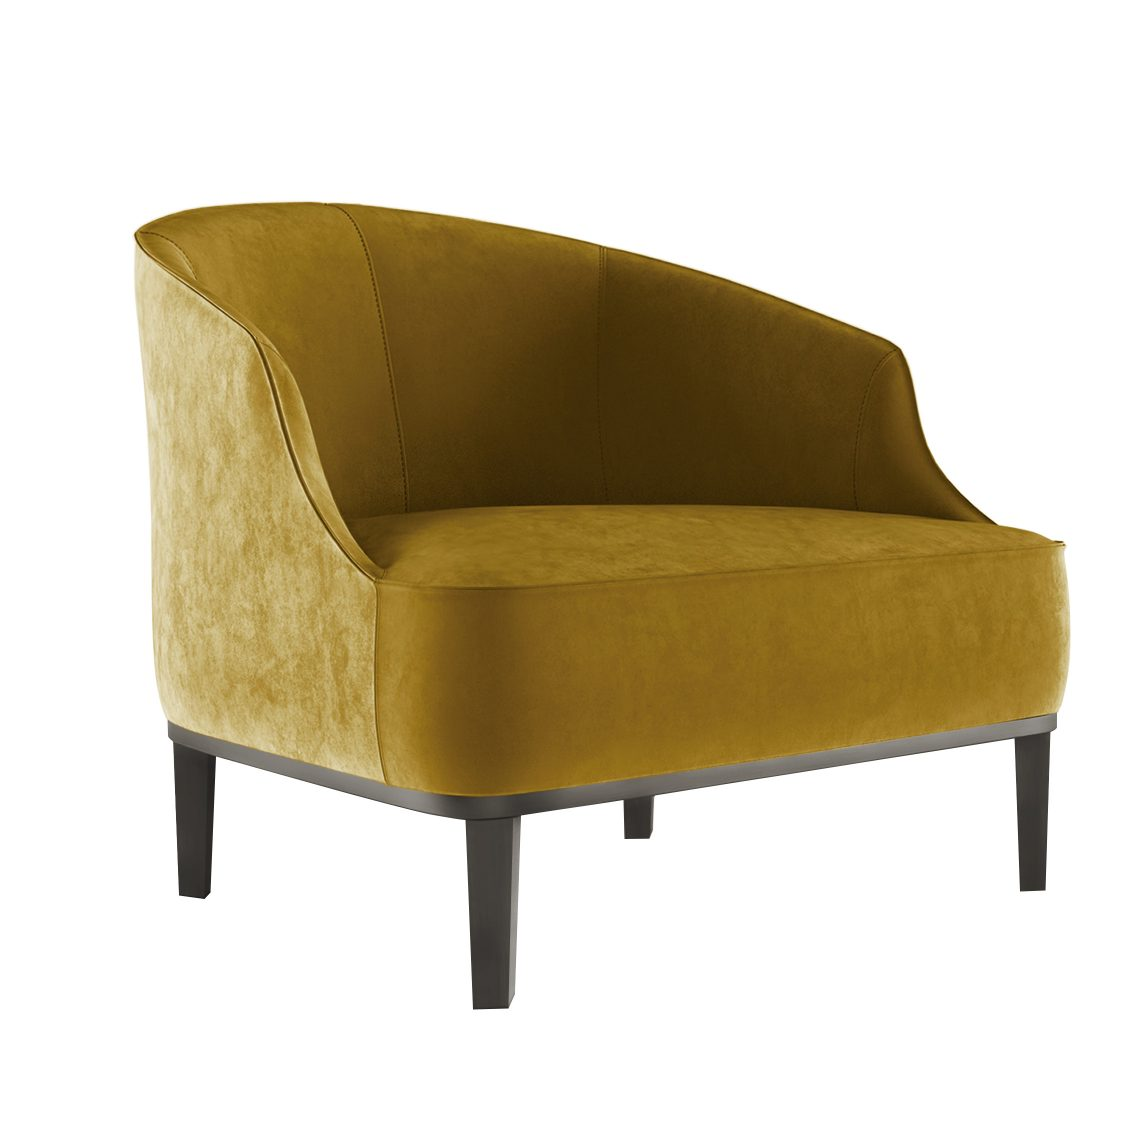 Интерьерное кресло для зала Стефан